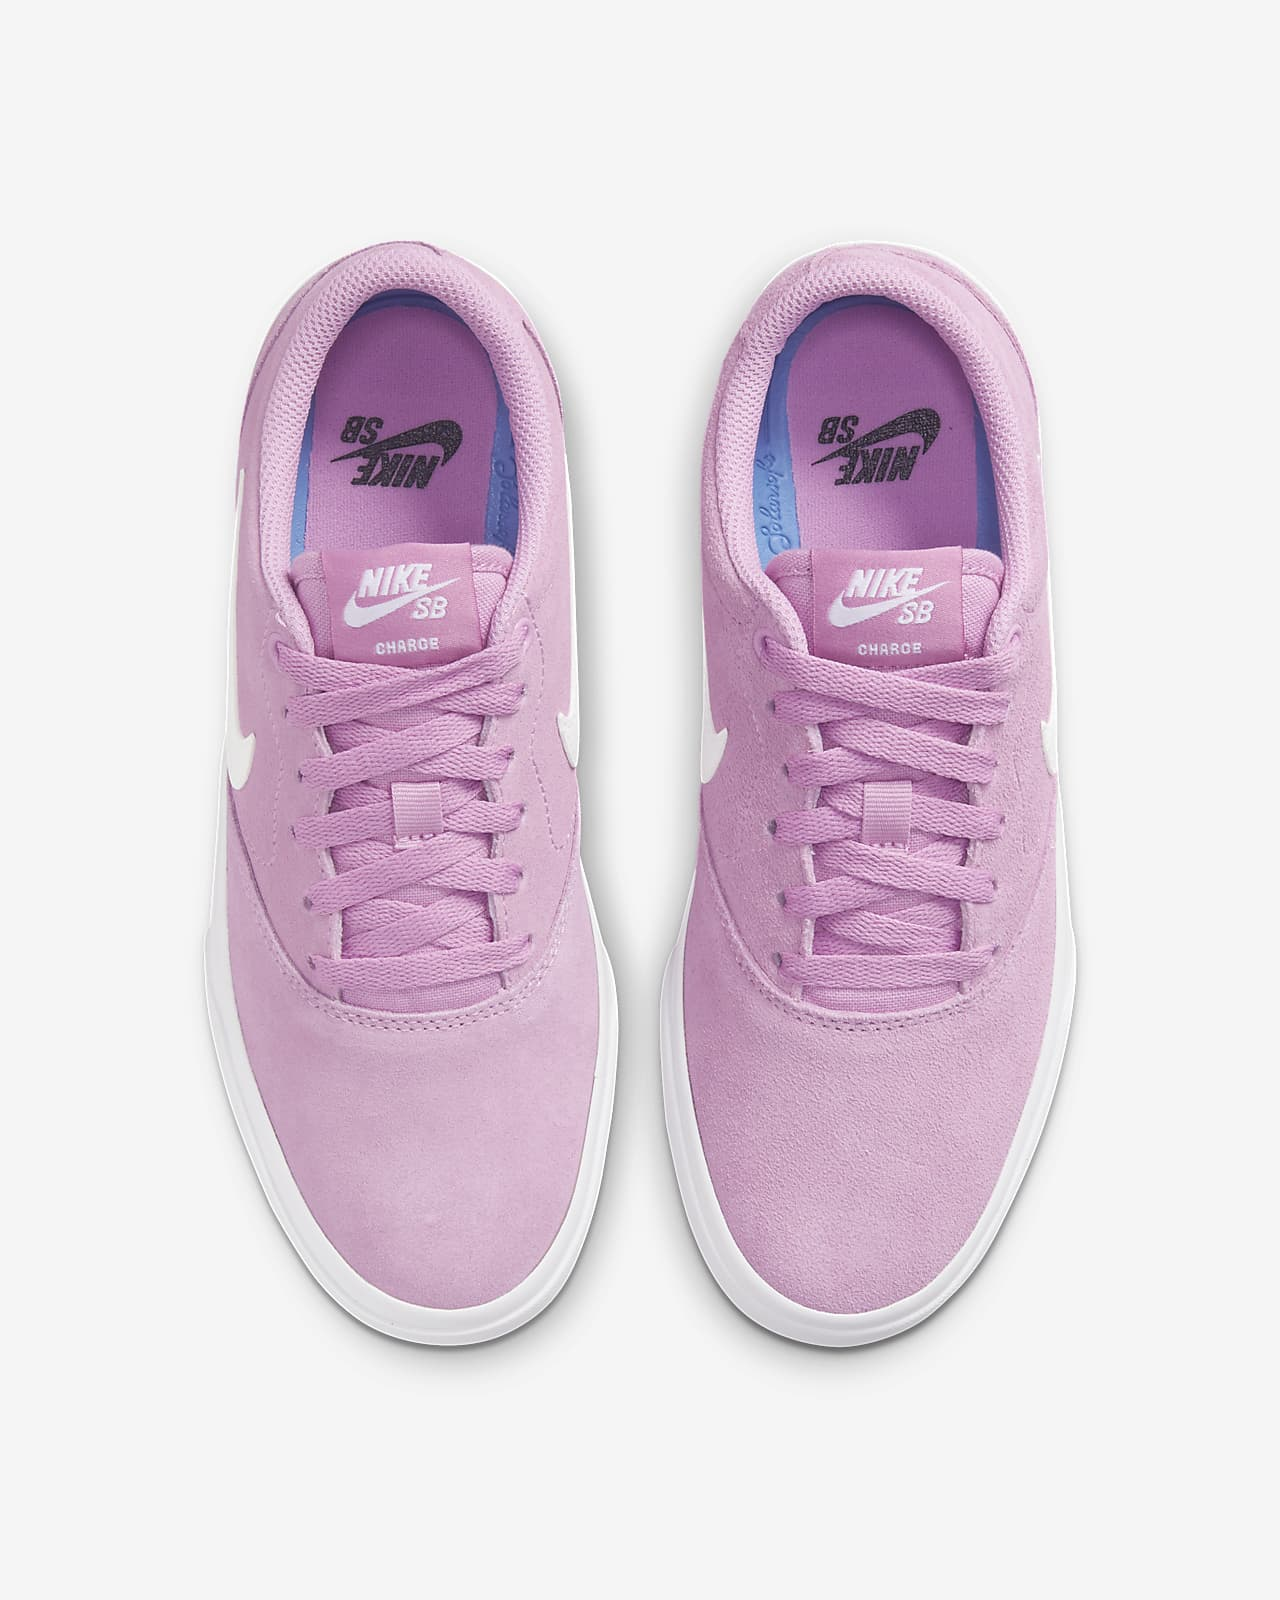 Chaussure de skateboard Nike SB Charge Suede pour Femme. Nike LU